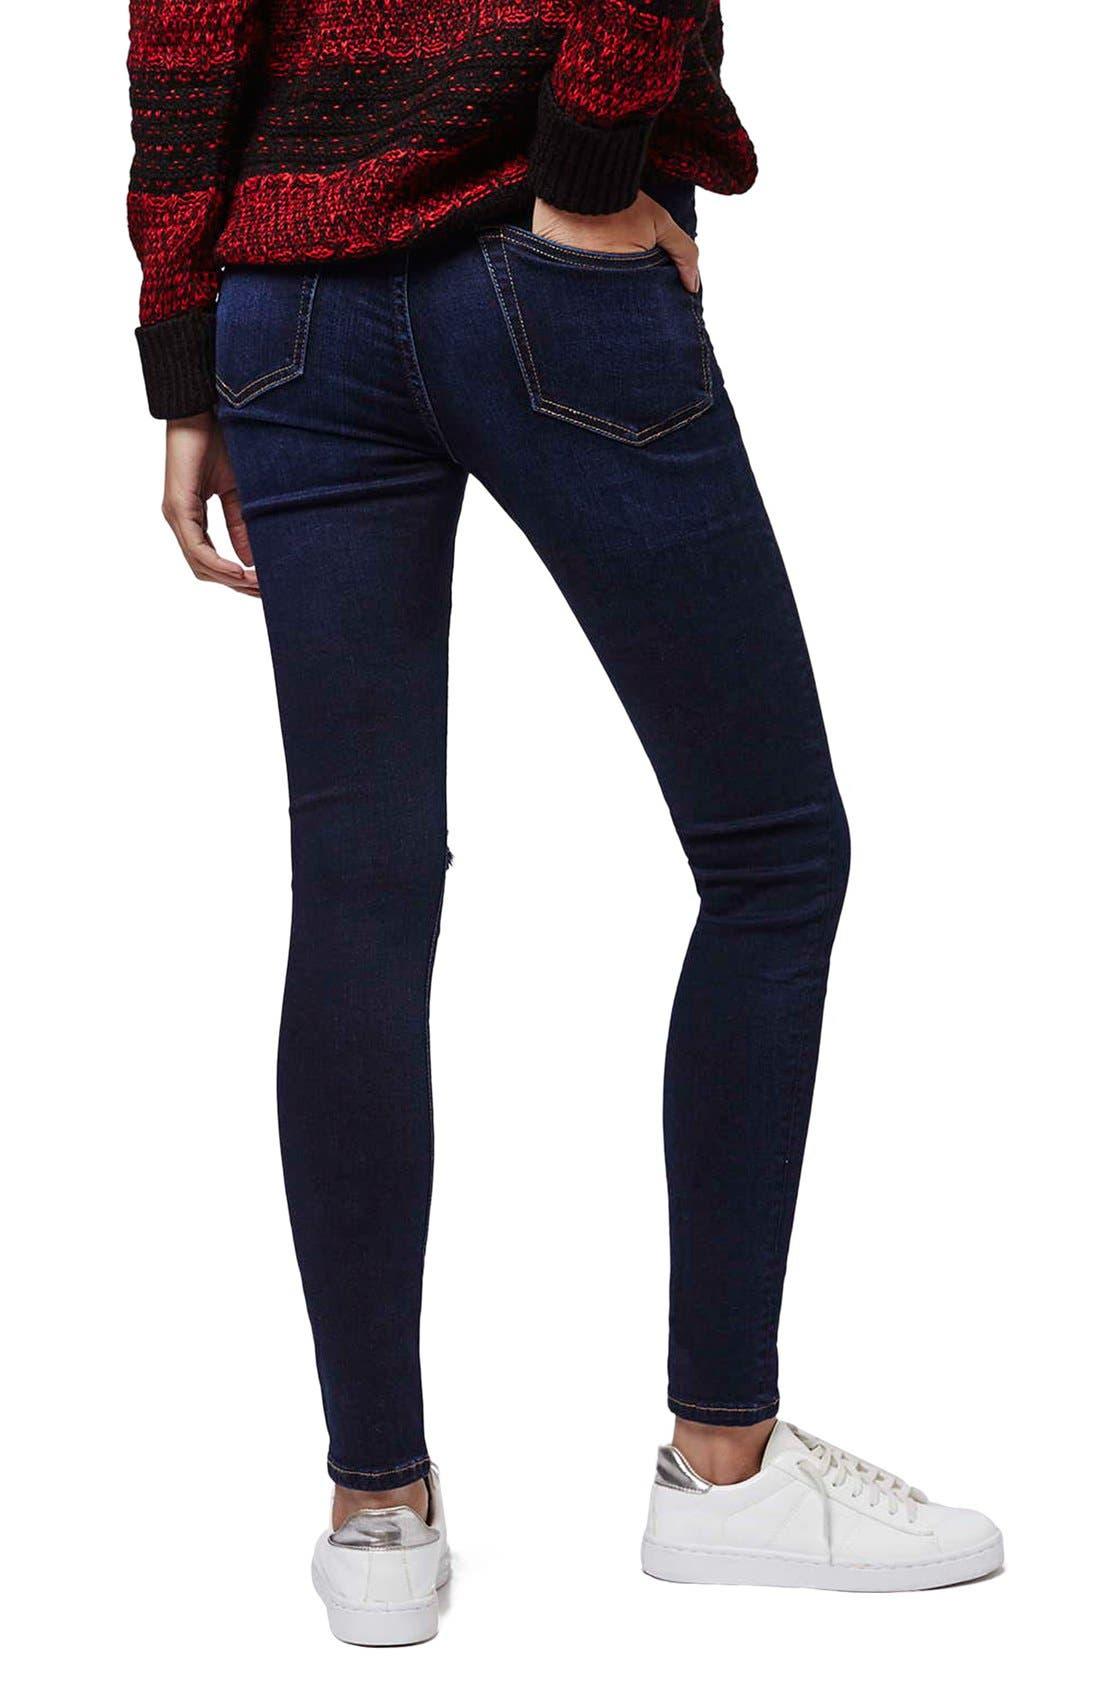 Alternate Image 3  - Topshop Moto 'Jamie' Ripped Skinny Jeans (Navy Blue)